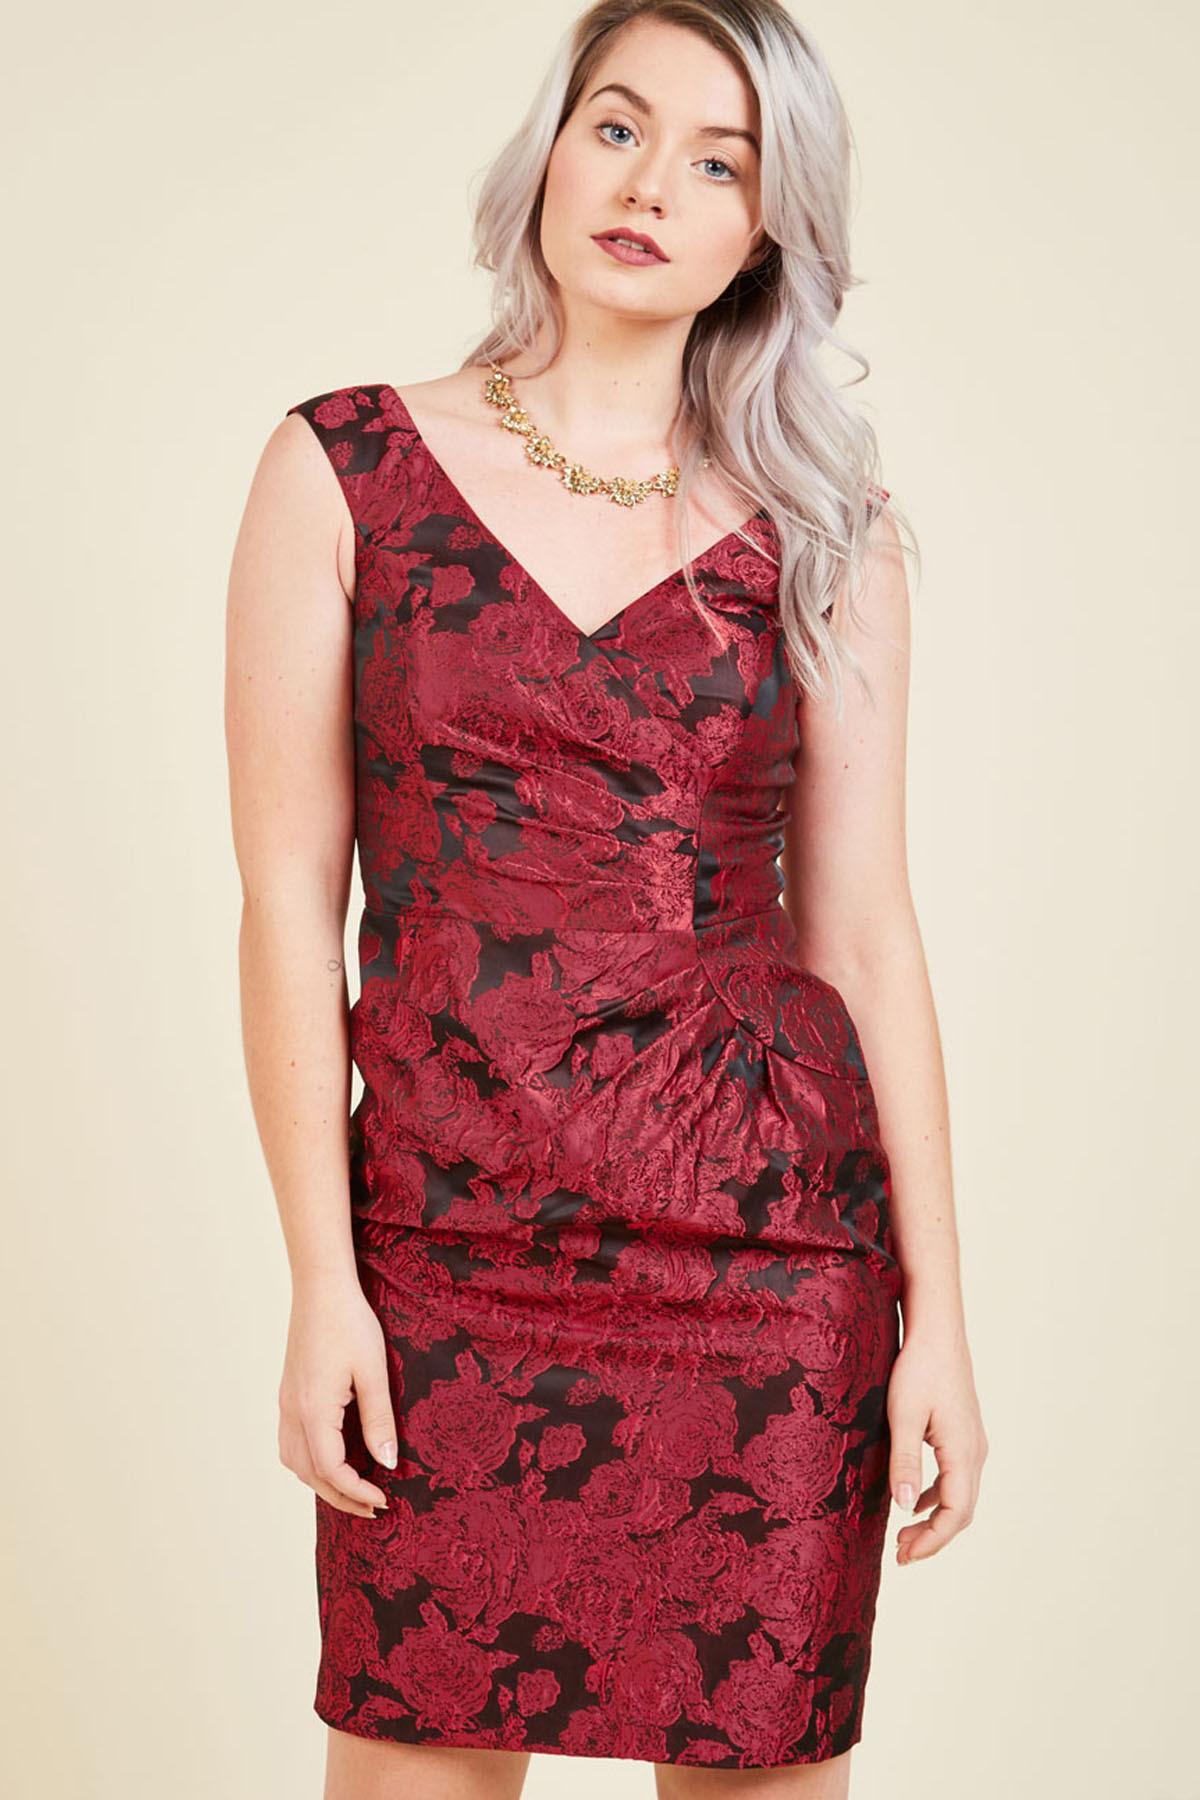 15 pretty valentine's day dresses under 50  date night